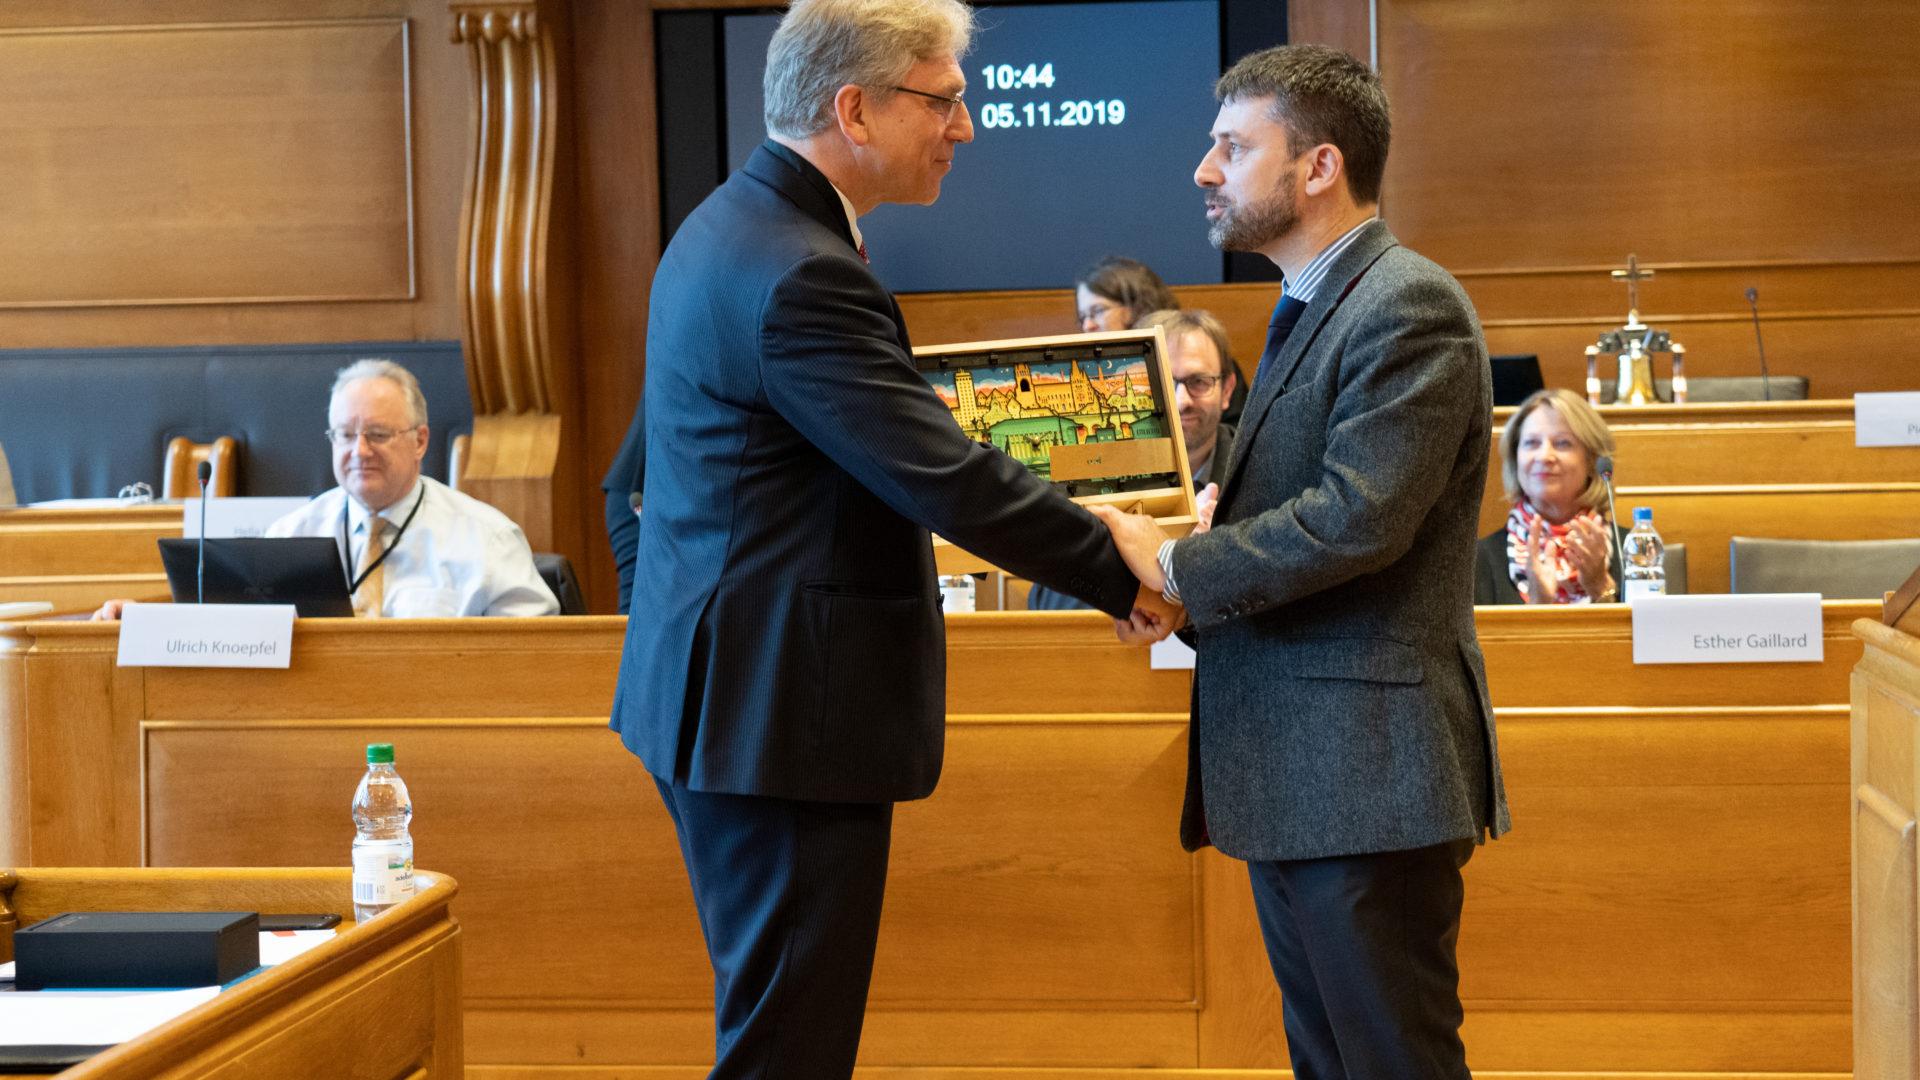 ÖRK-Generalsekretär Tveit, Ratspräsident Gottfried Locher